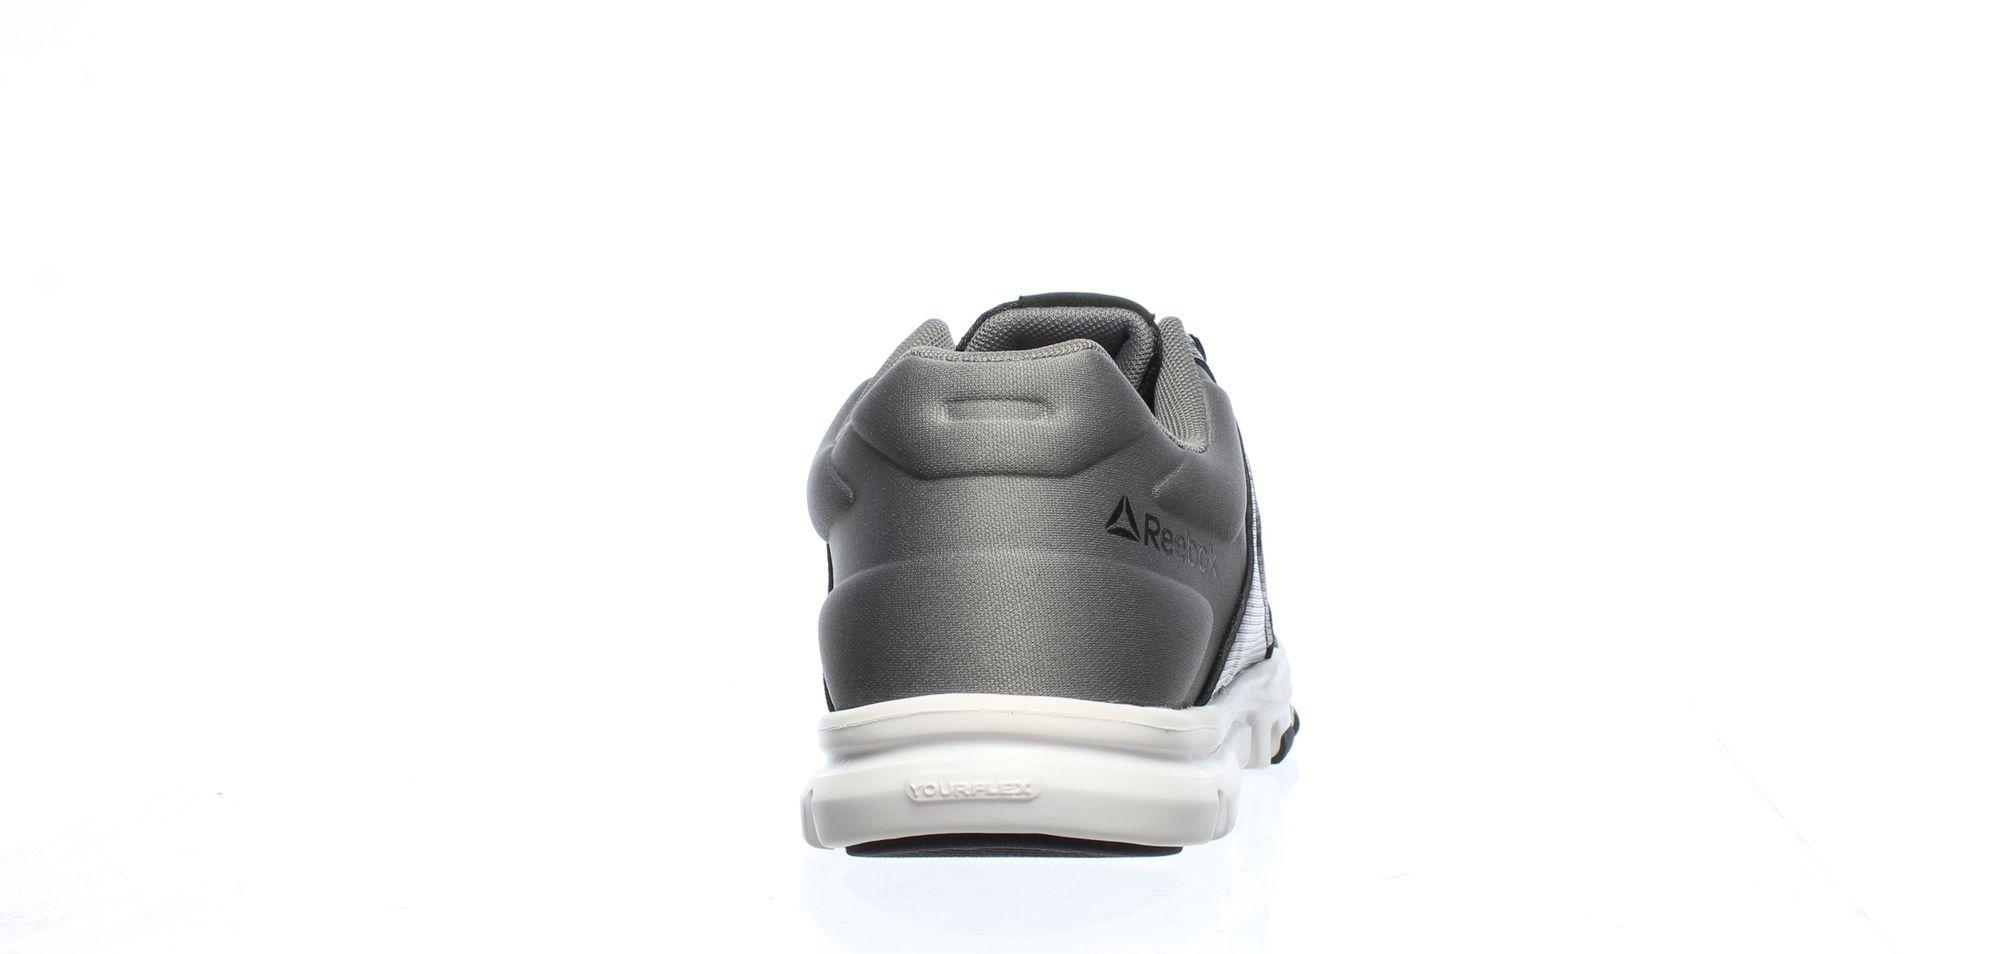 Reebok-Mens-Yourflex-Train-10-Cross-Training-Shoes miniature 6